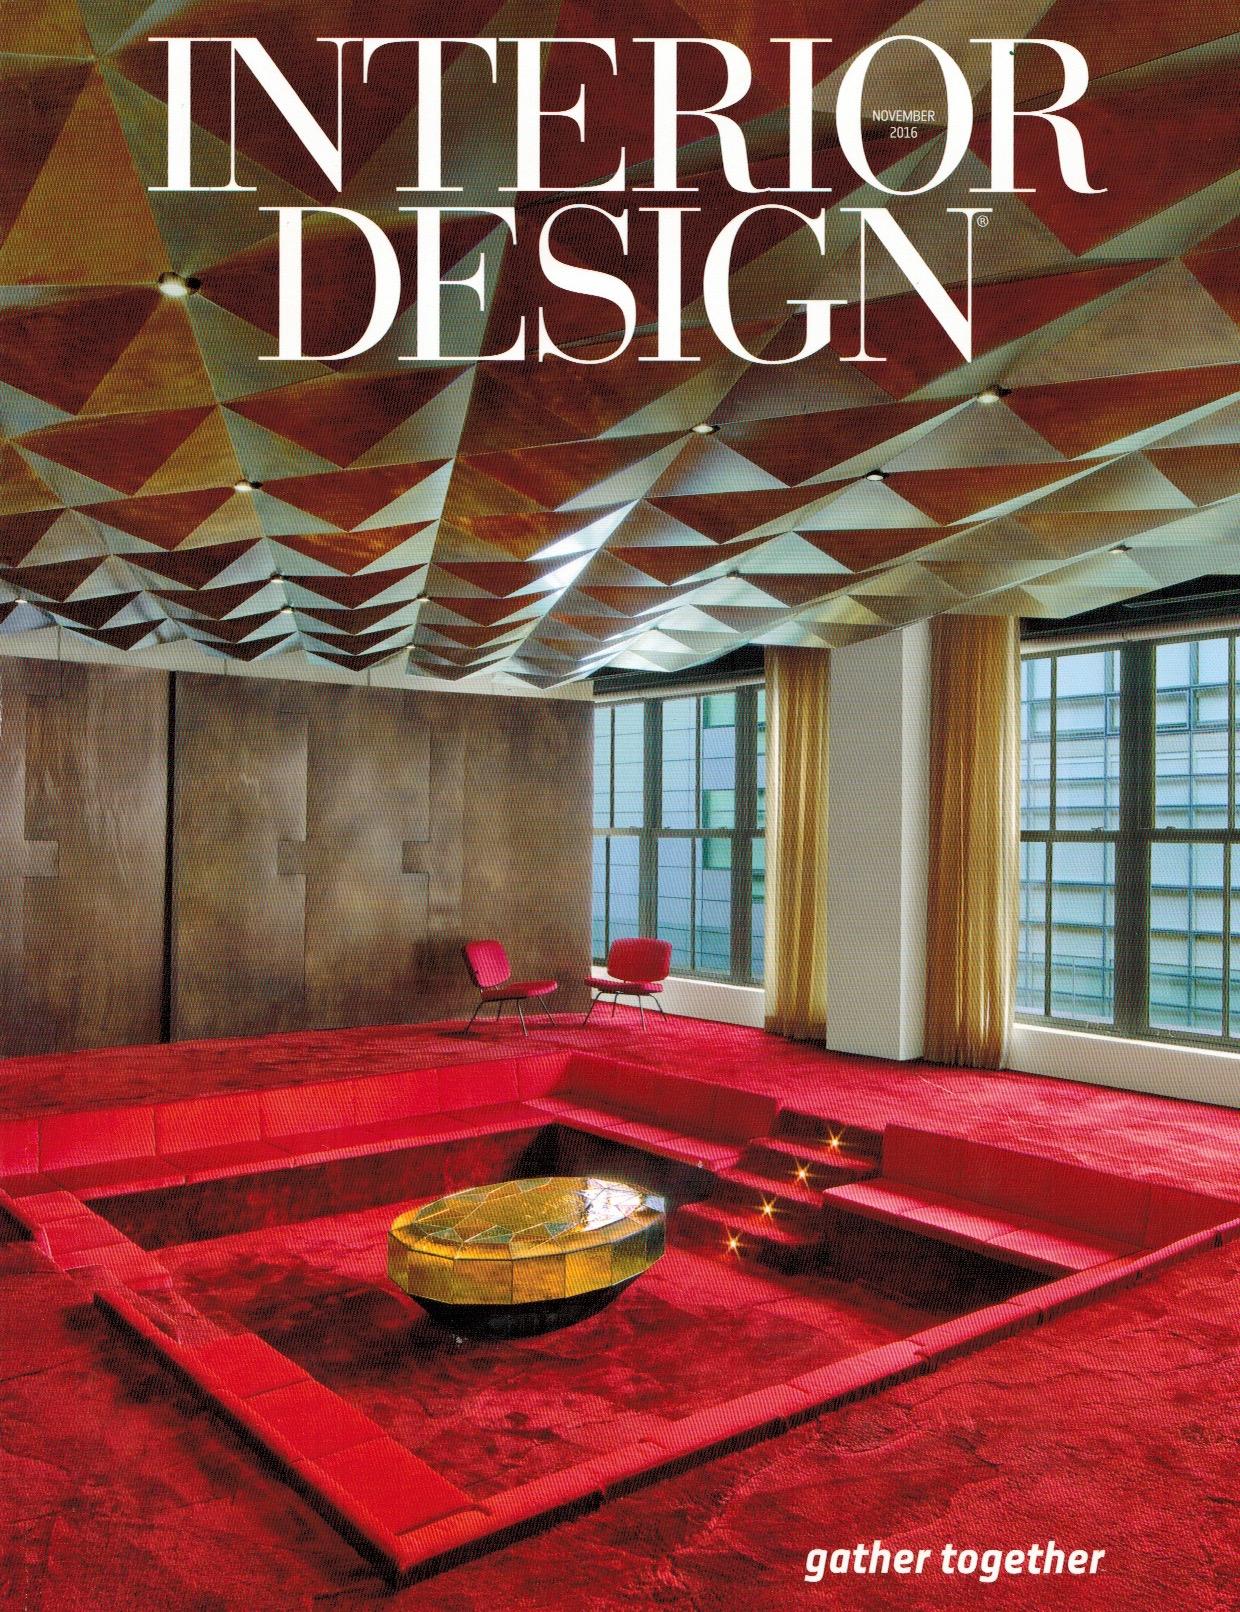 Interior Design page.jpg